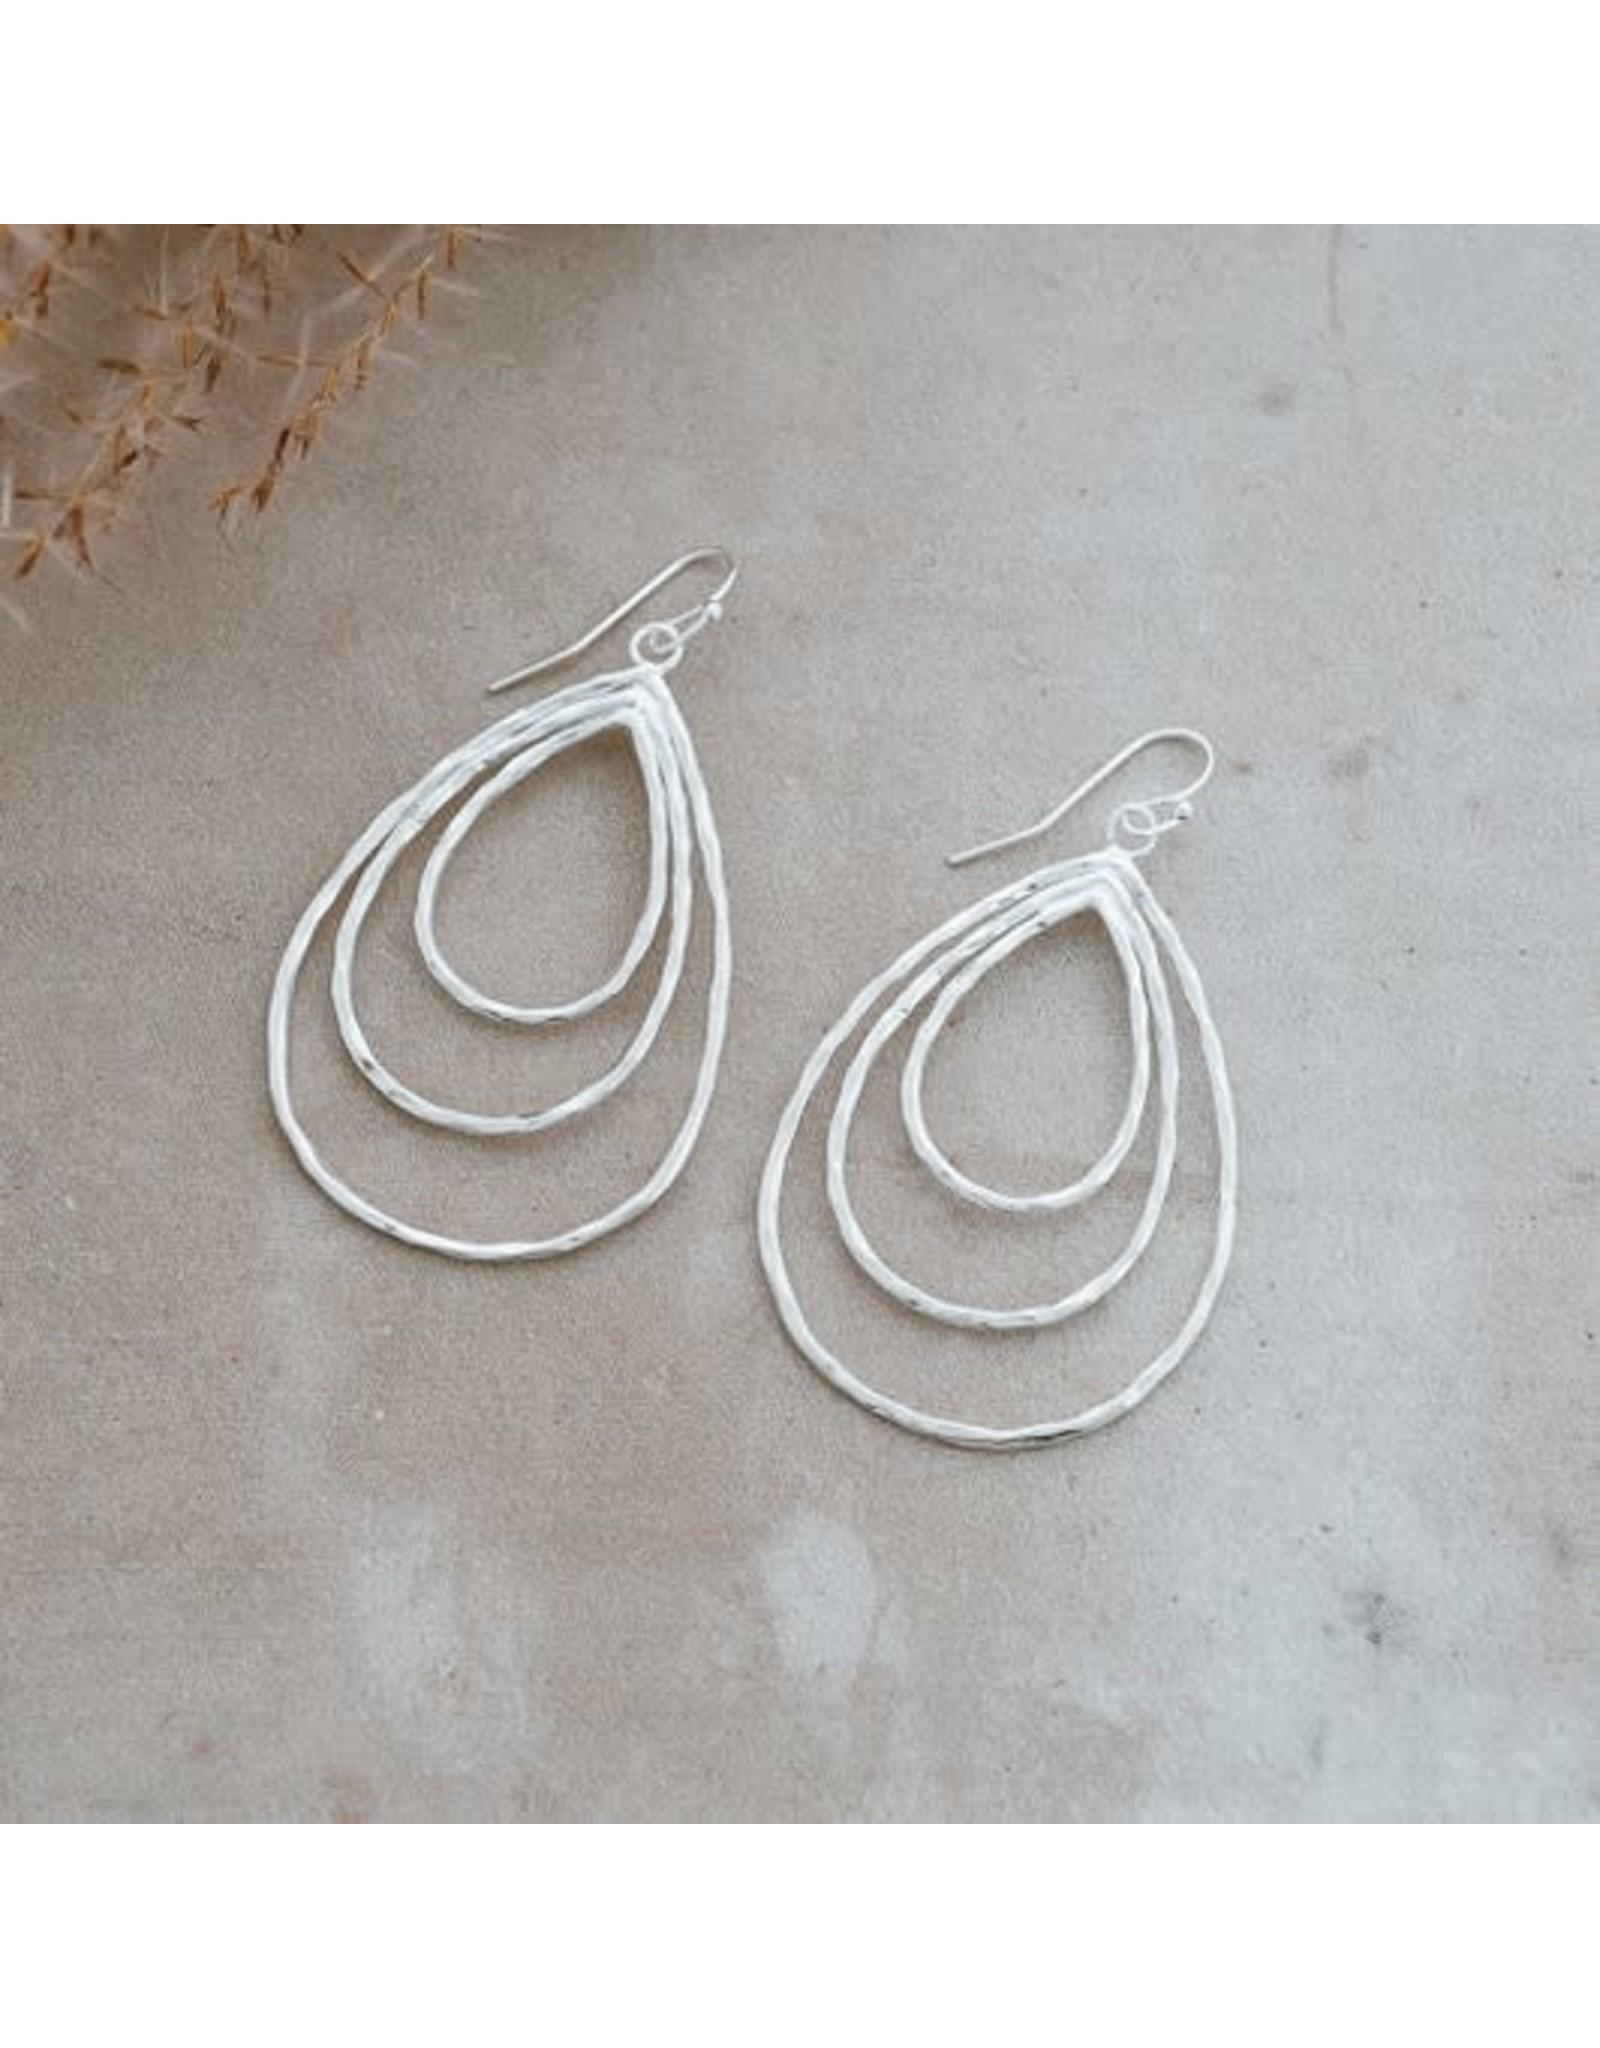 Glee jewelry Divergence Earrings, Silver